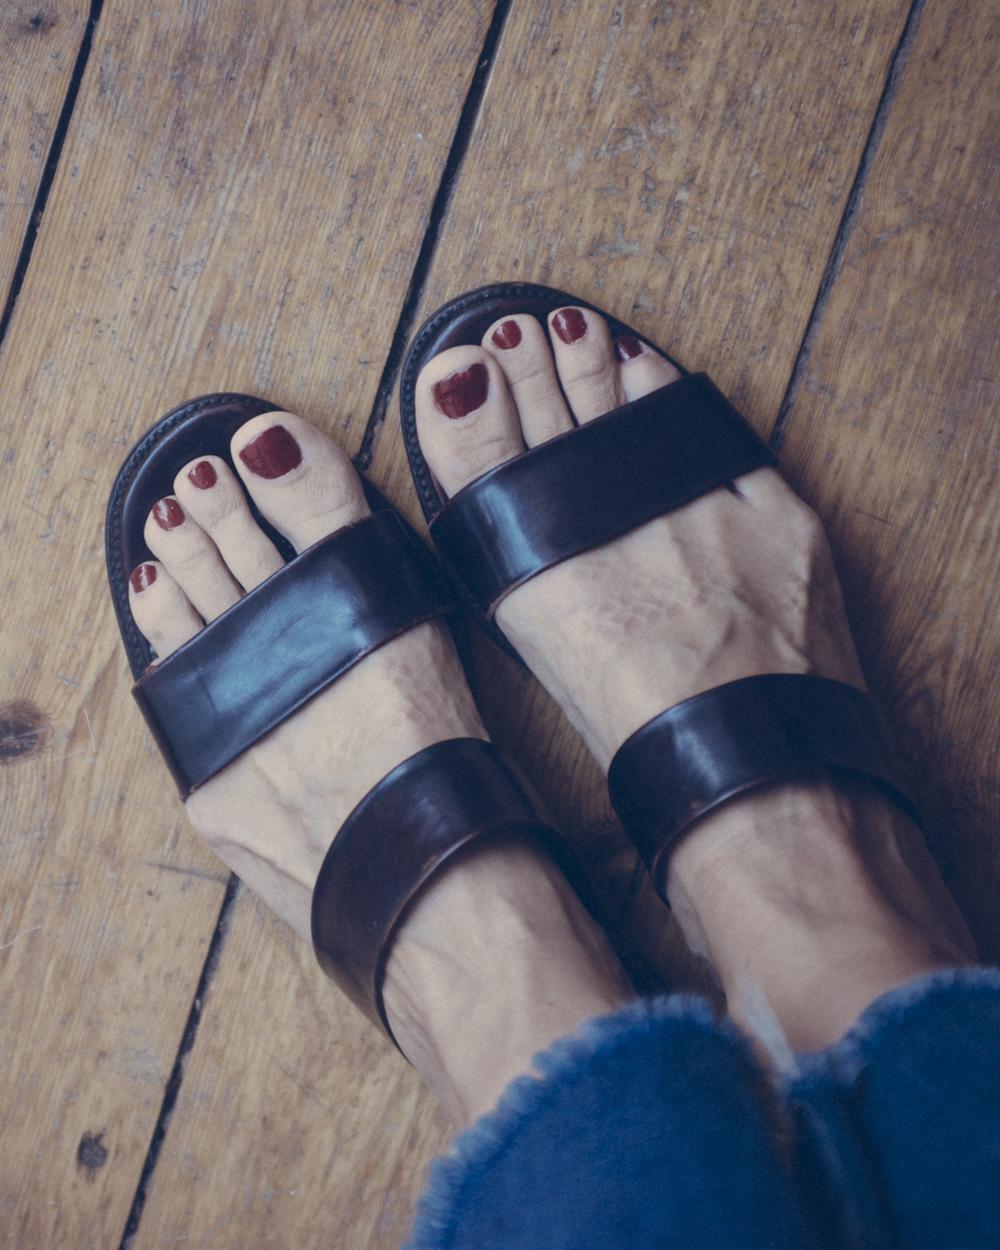 Sandals by Jil Sander